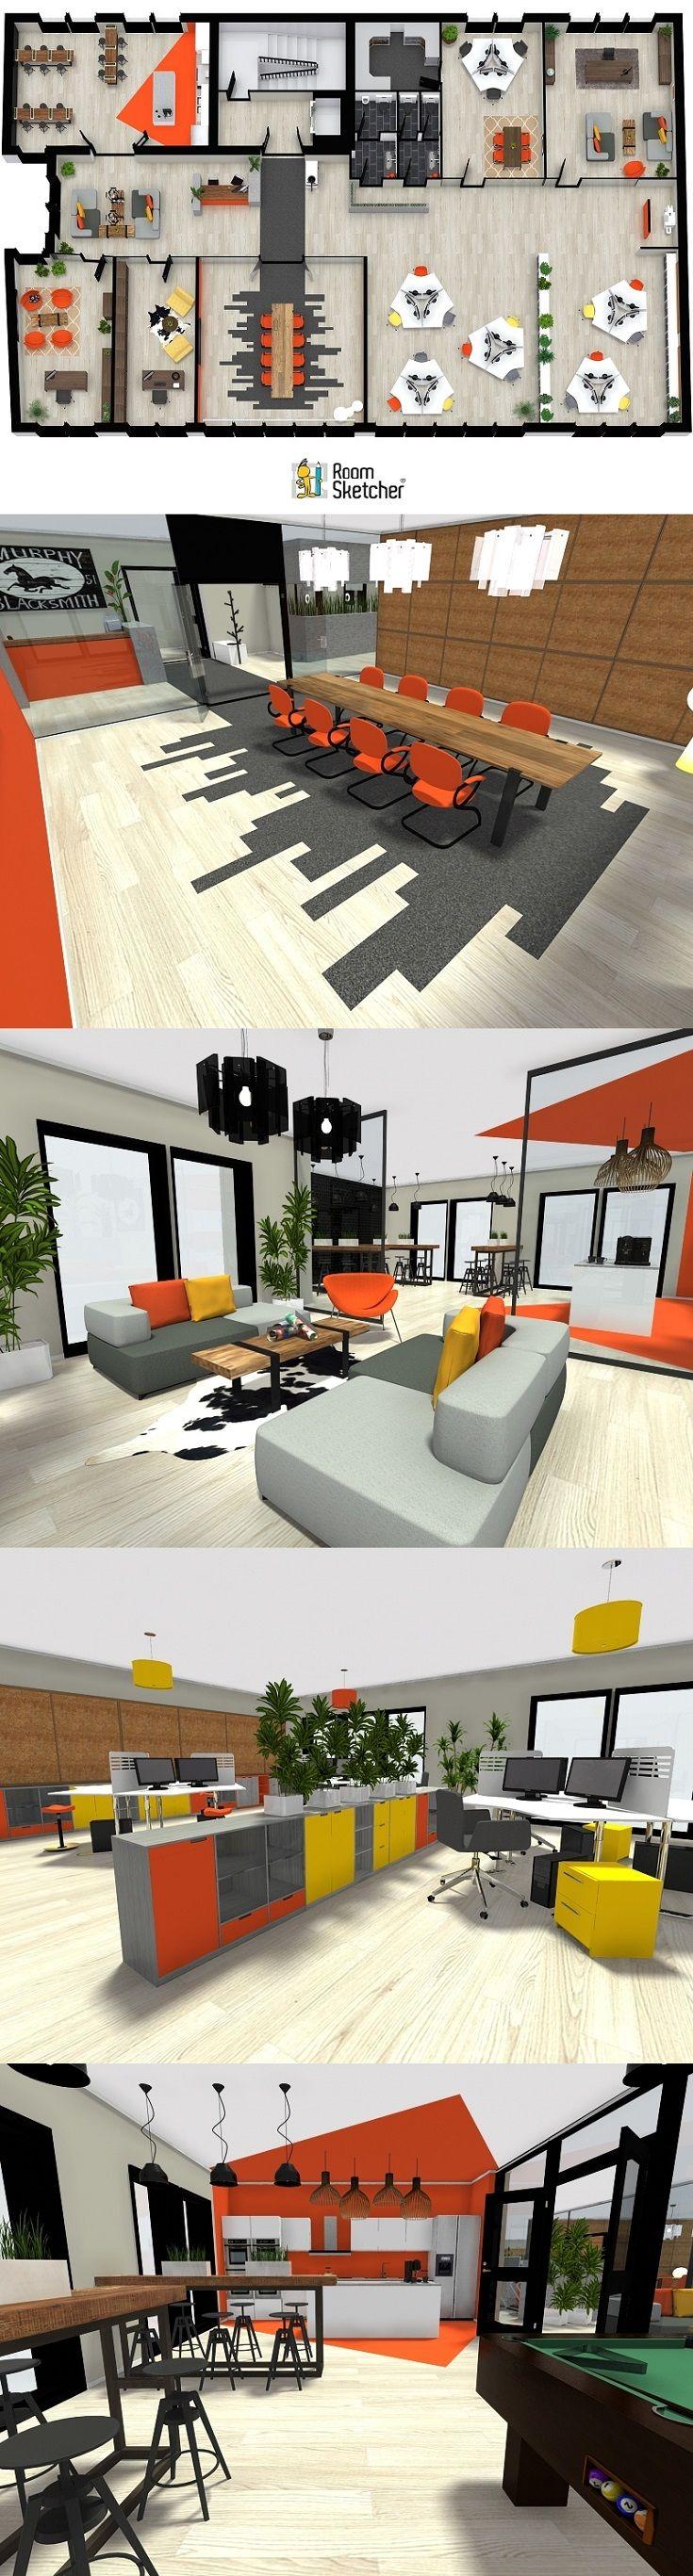 725 best get interior design inspired images on pinterest floor